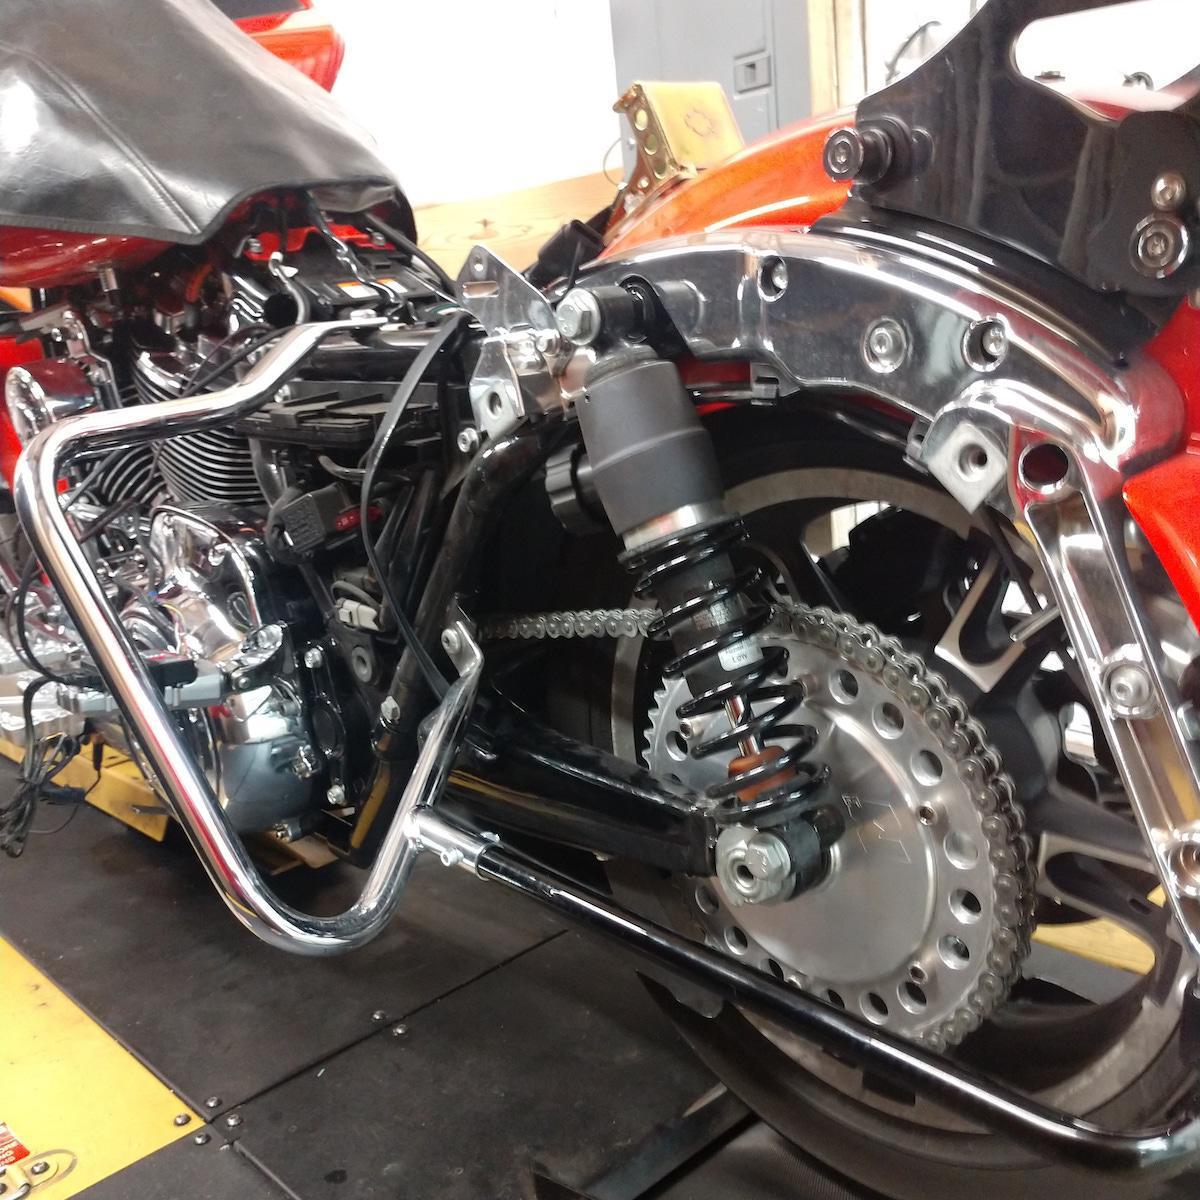 MAD MONKEY MOTORSPORTS - Cush Drive Chain Conversion